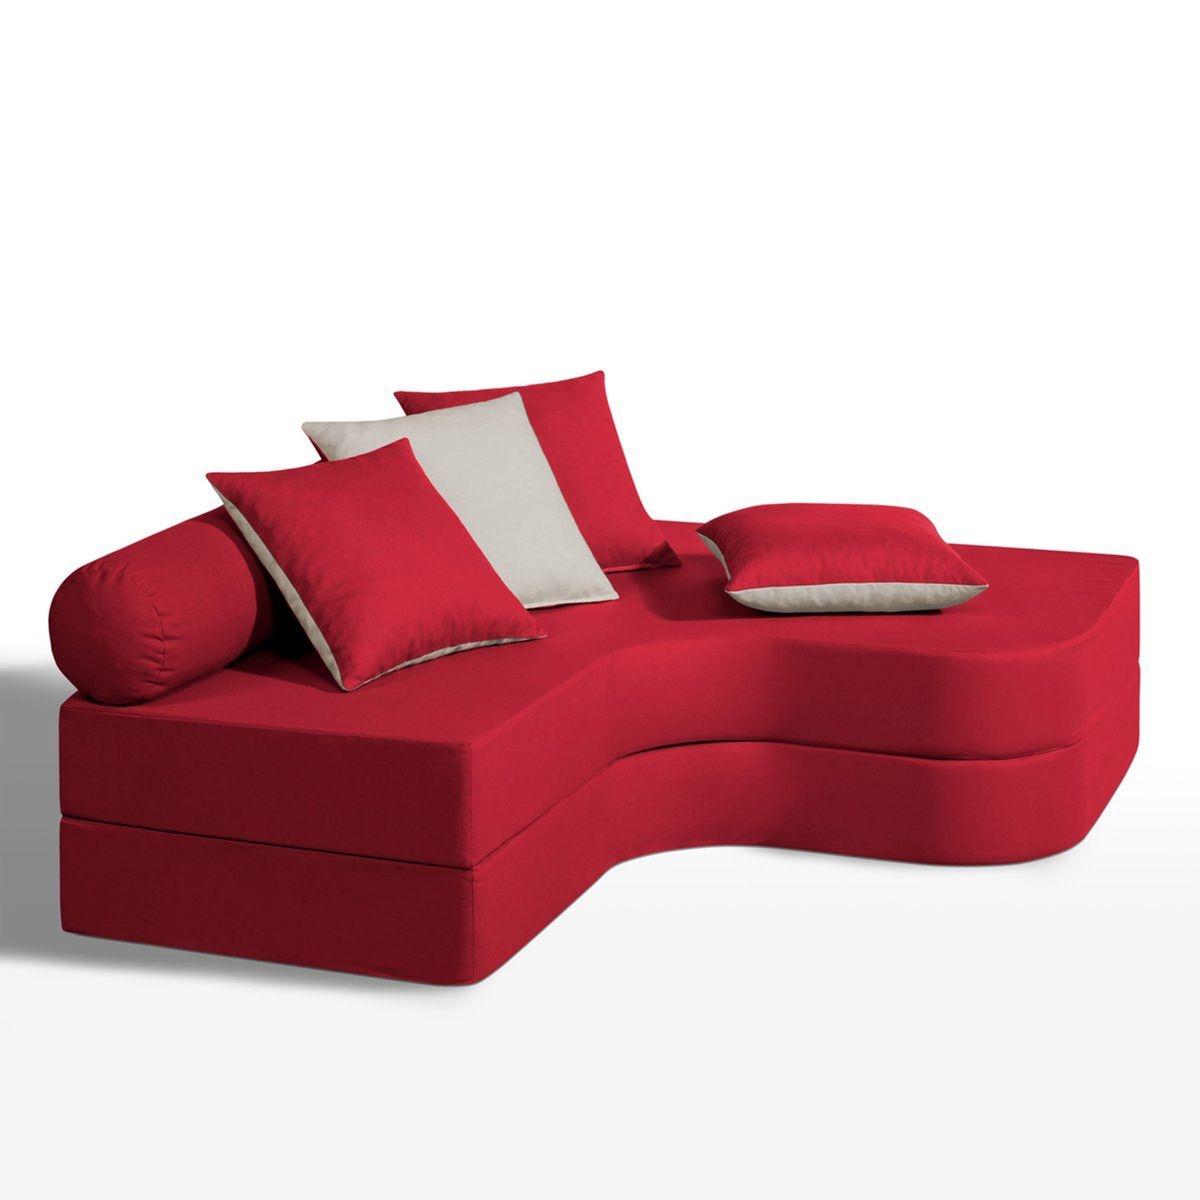 banquette lit d 39 angle confort mousse. Black Bedroom Furniture Sets. Home Design Ideas